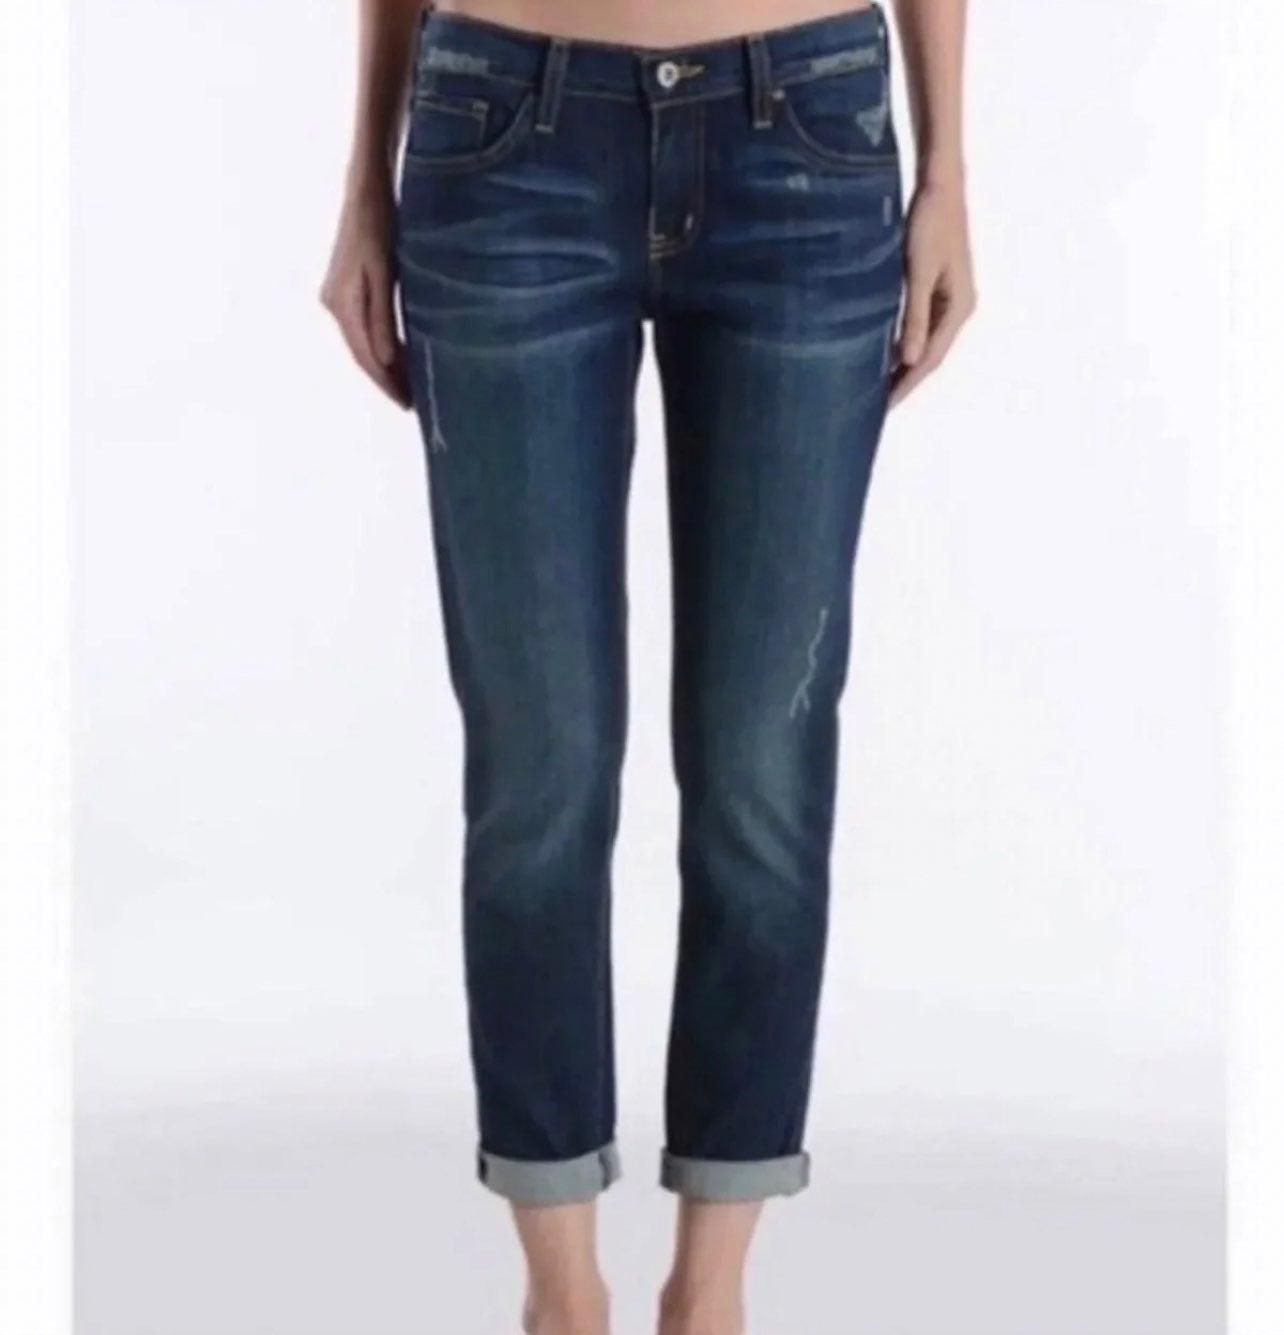 Just Black Boyfriend Jeans Buckle